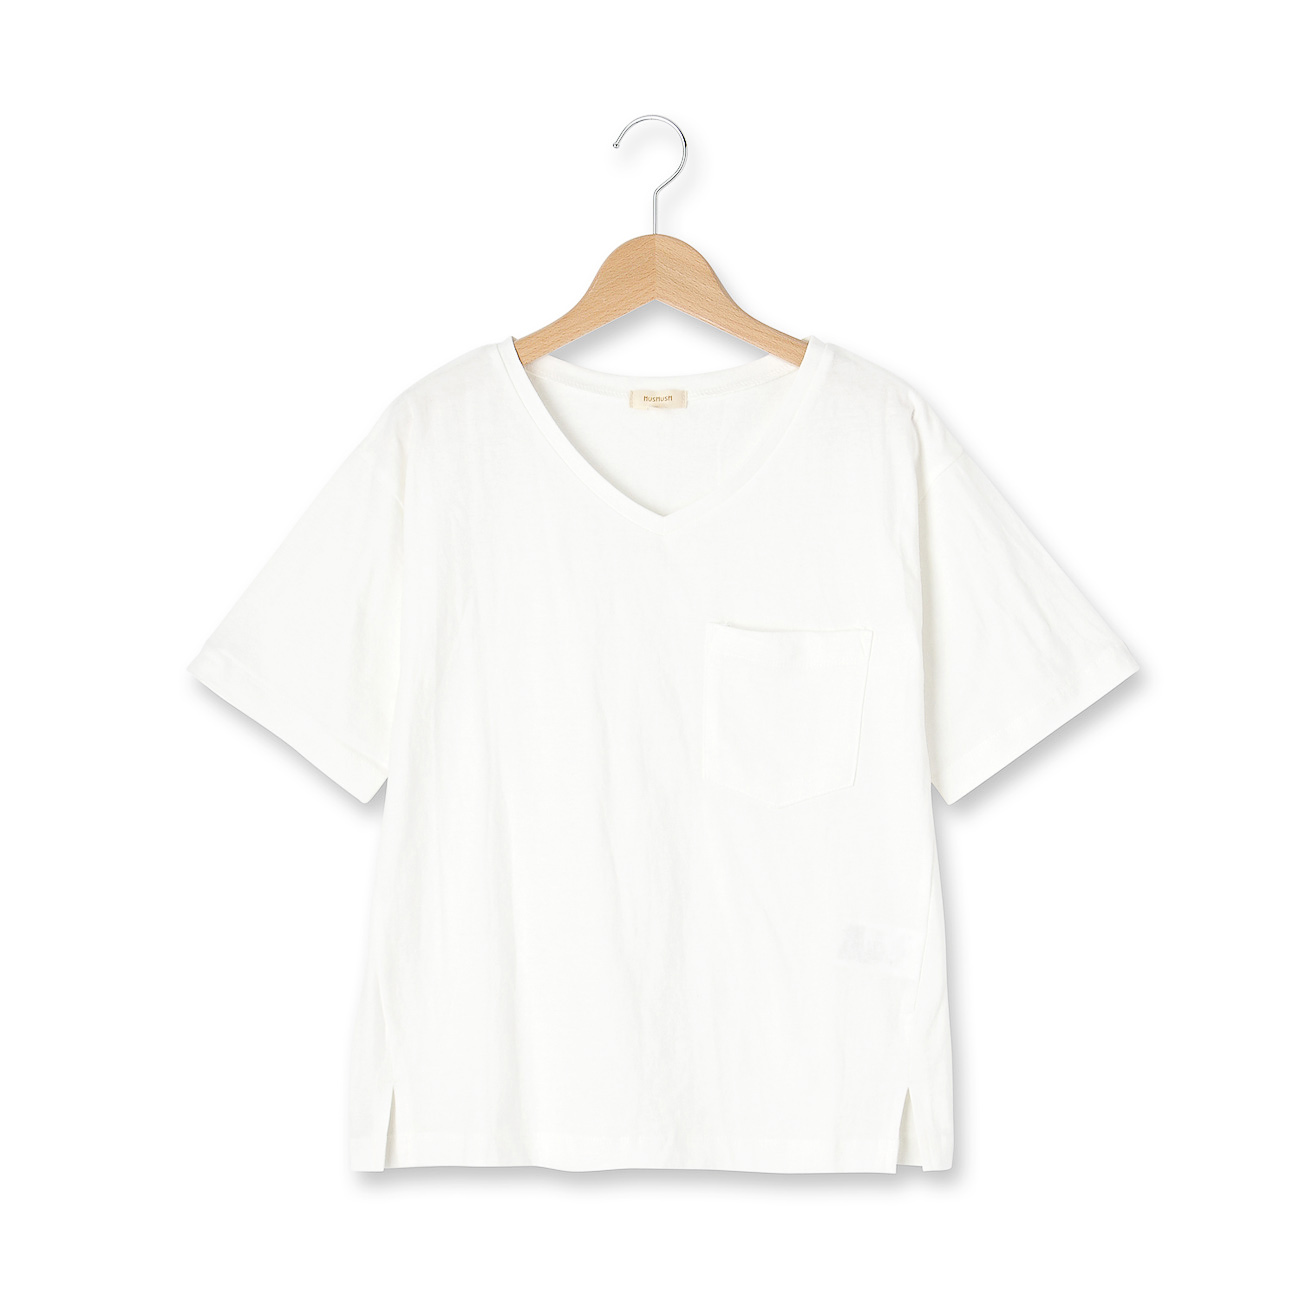 【HusHusH (ハッシュアッシュ)】Vネックポケット付きプルオーバーレディース トップス|カットソー・Tシャツ オフホワイト